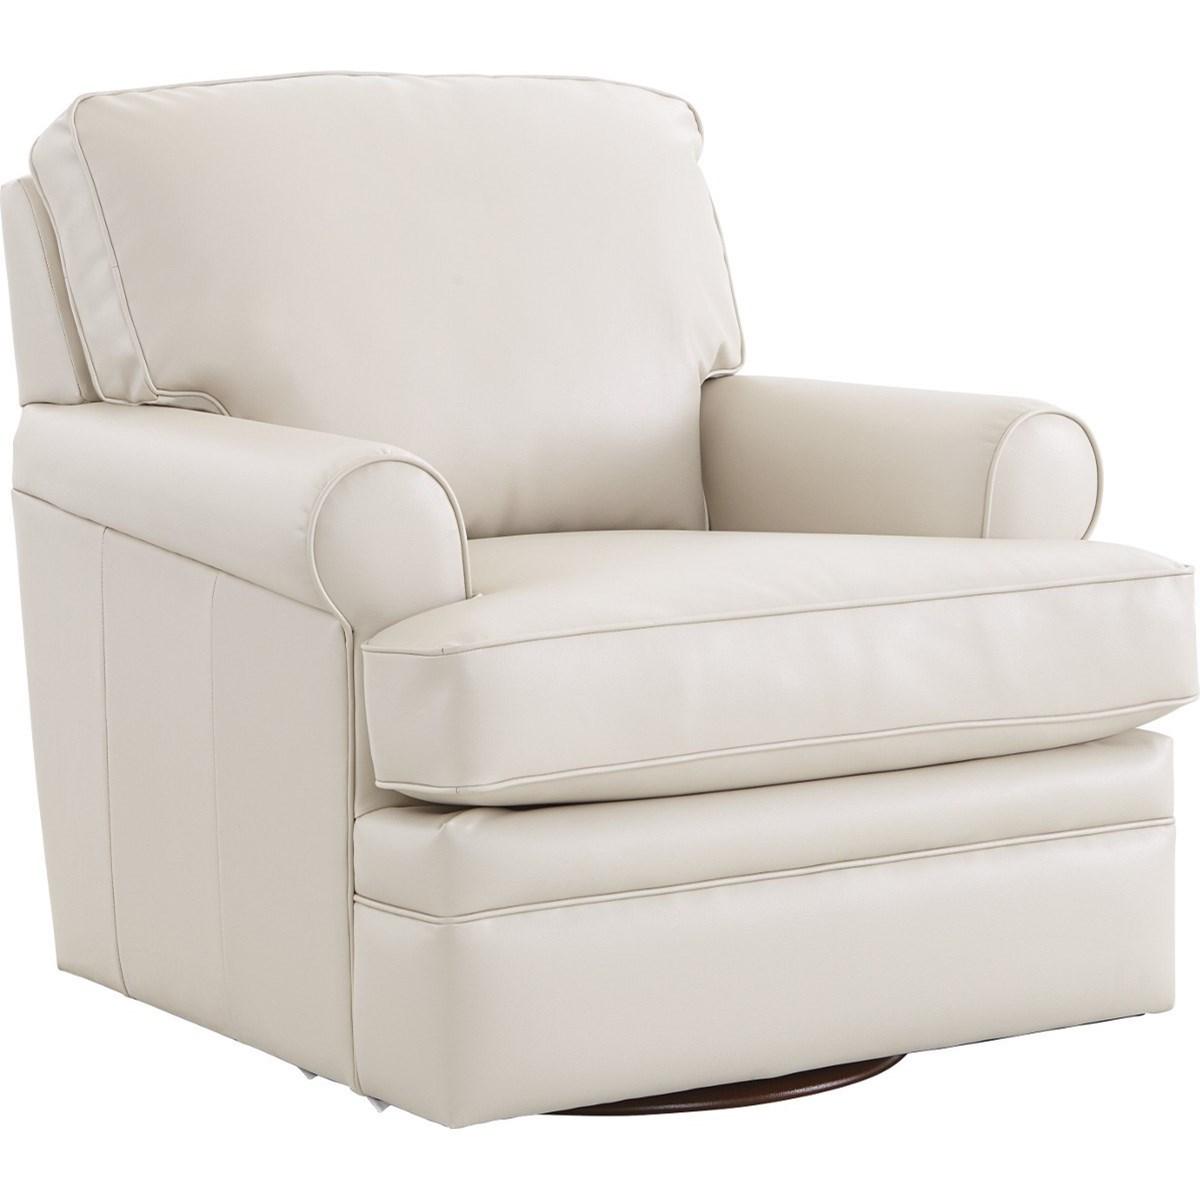 Bon La Z Boy Chairs Roxie Premier Swivel Glider